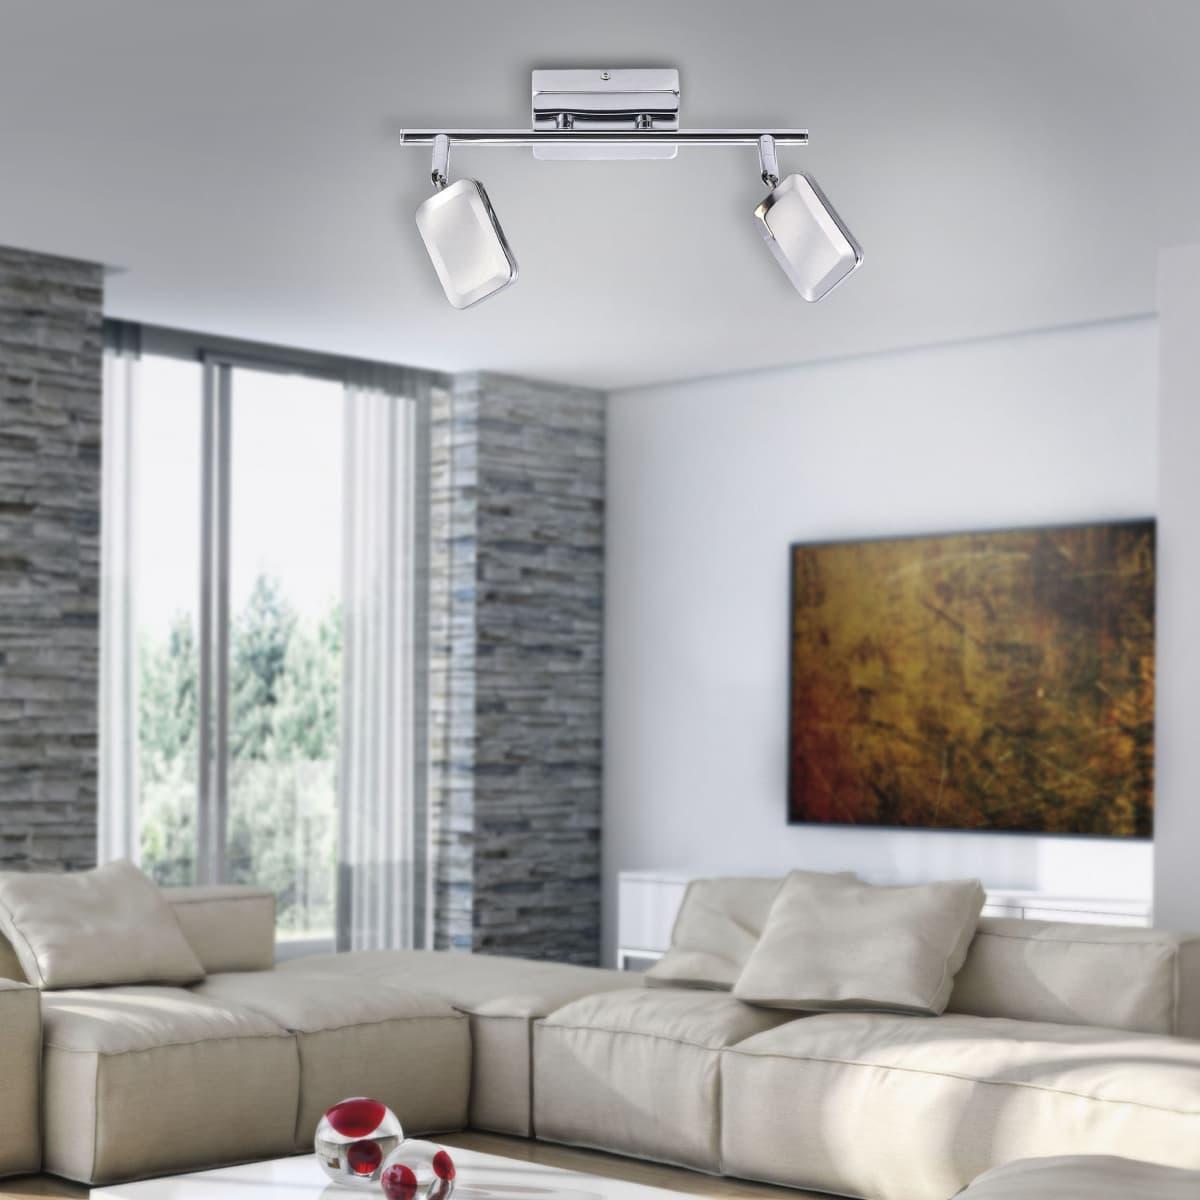 LED Wandleuchte, Deckenleuchte, 2-flammig, chrom